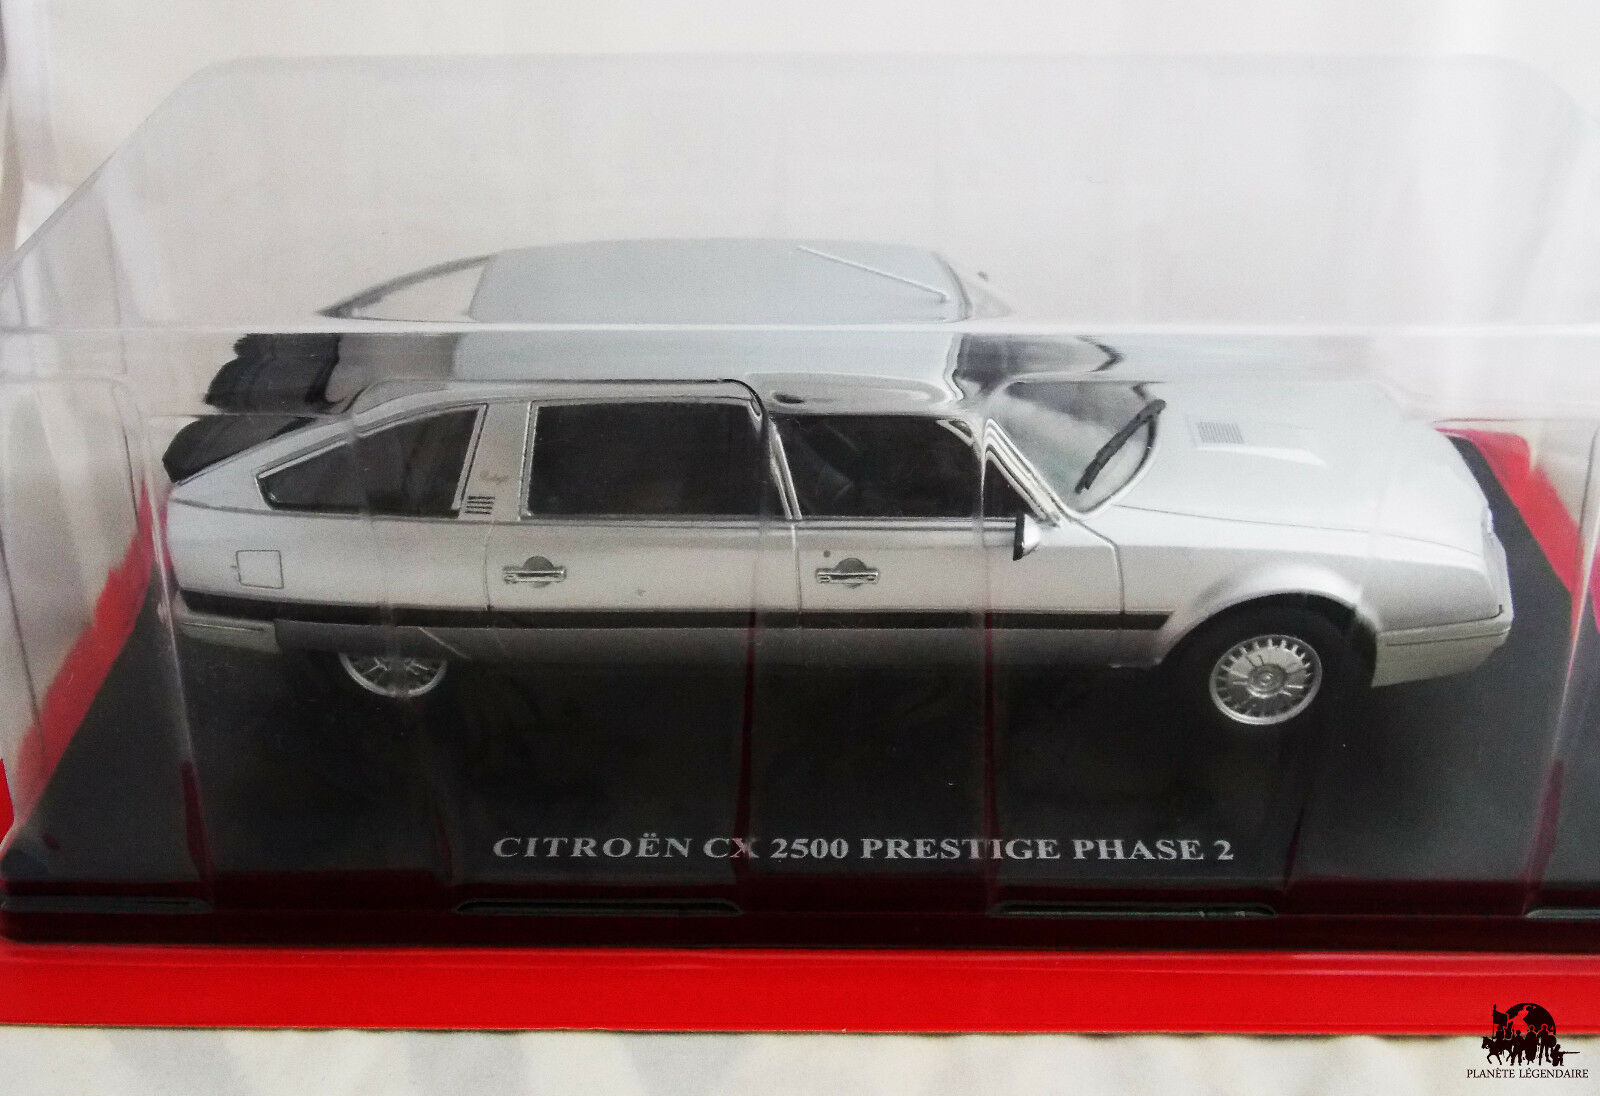 Envio gratis en todas las ordenes Miniature IXO Echelle 1 24 24 24 CITROEN CX 2500 Prestige Phase 2 1985 NEUF  ¡no ser extrañado!